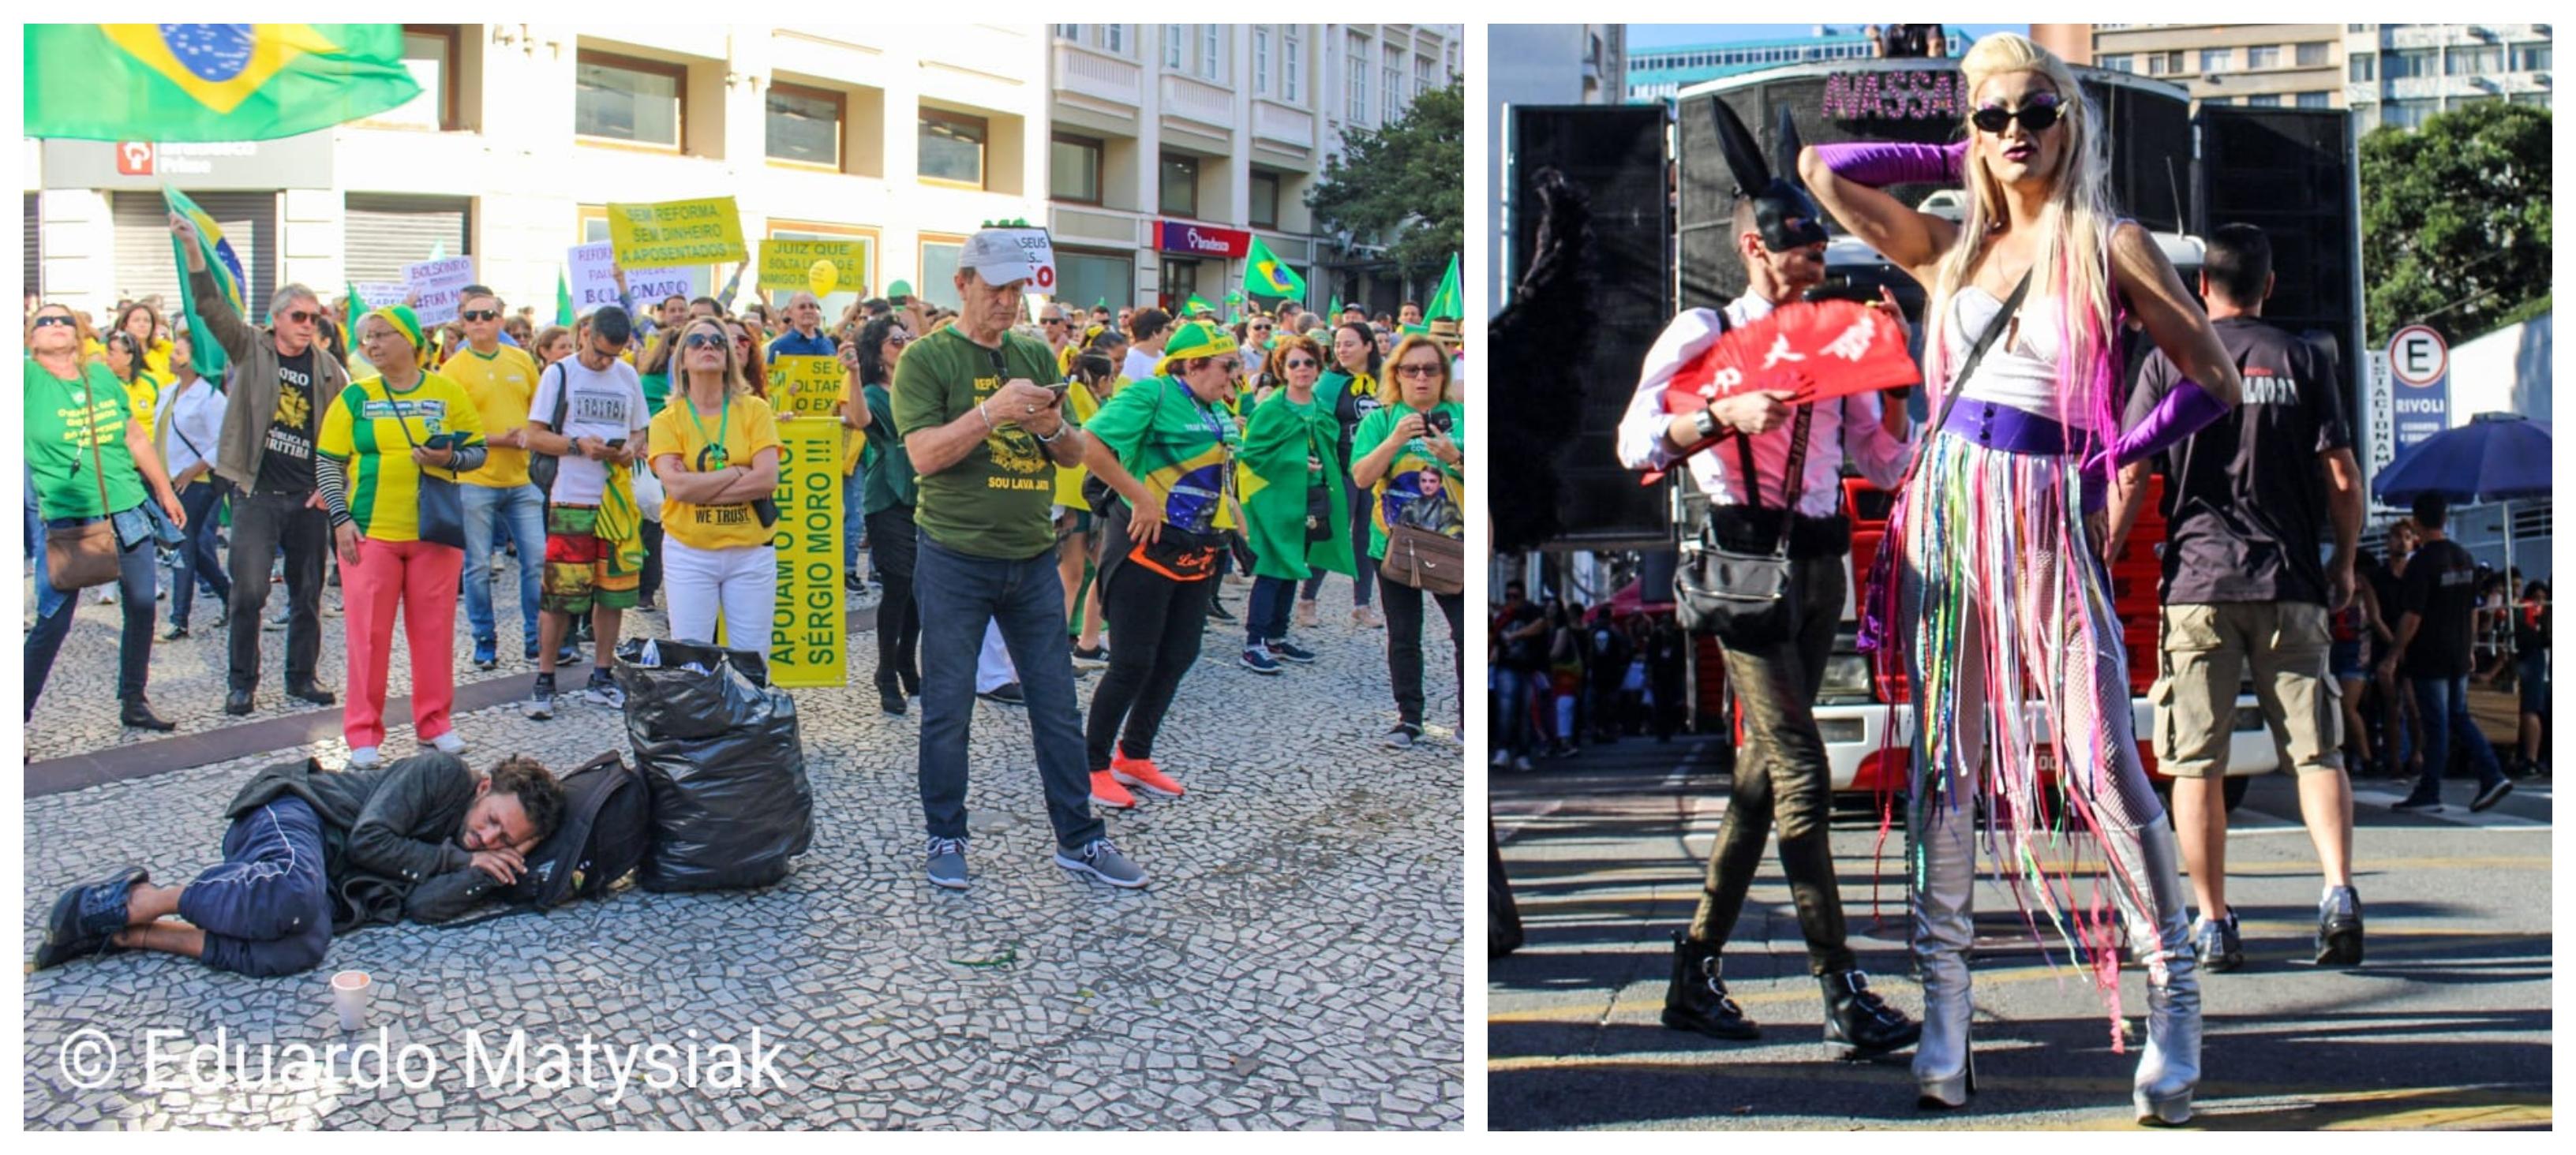 Na capital da Lava Jato, Marcha da Diversidade teve muito mais gente do que ato em apoio a Moro e Deltan; fotos